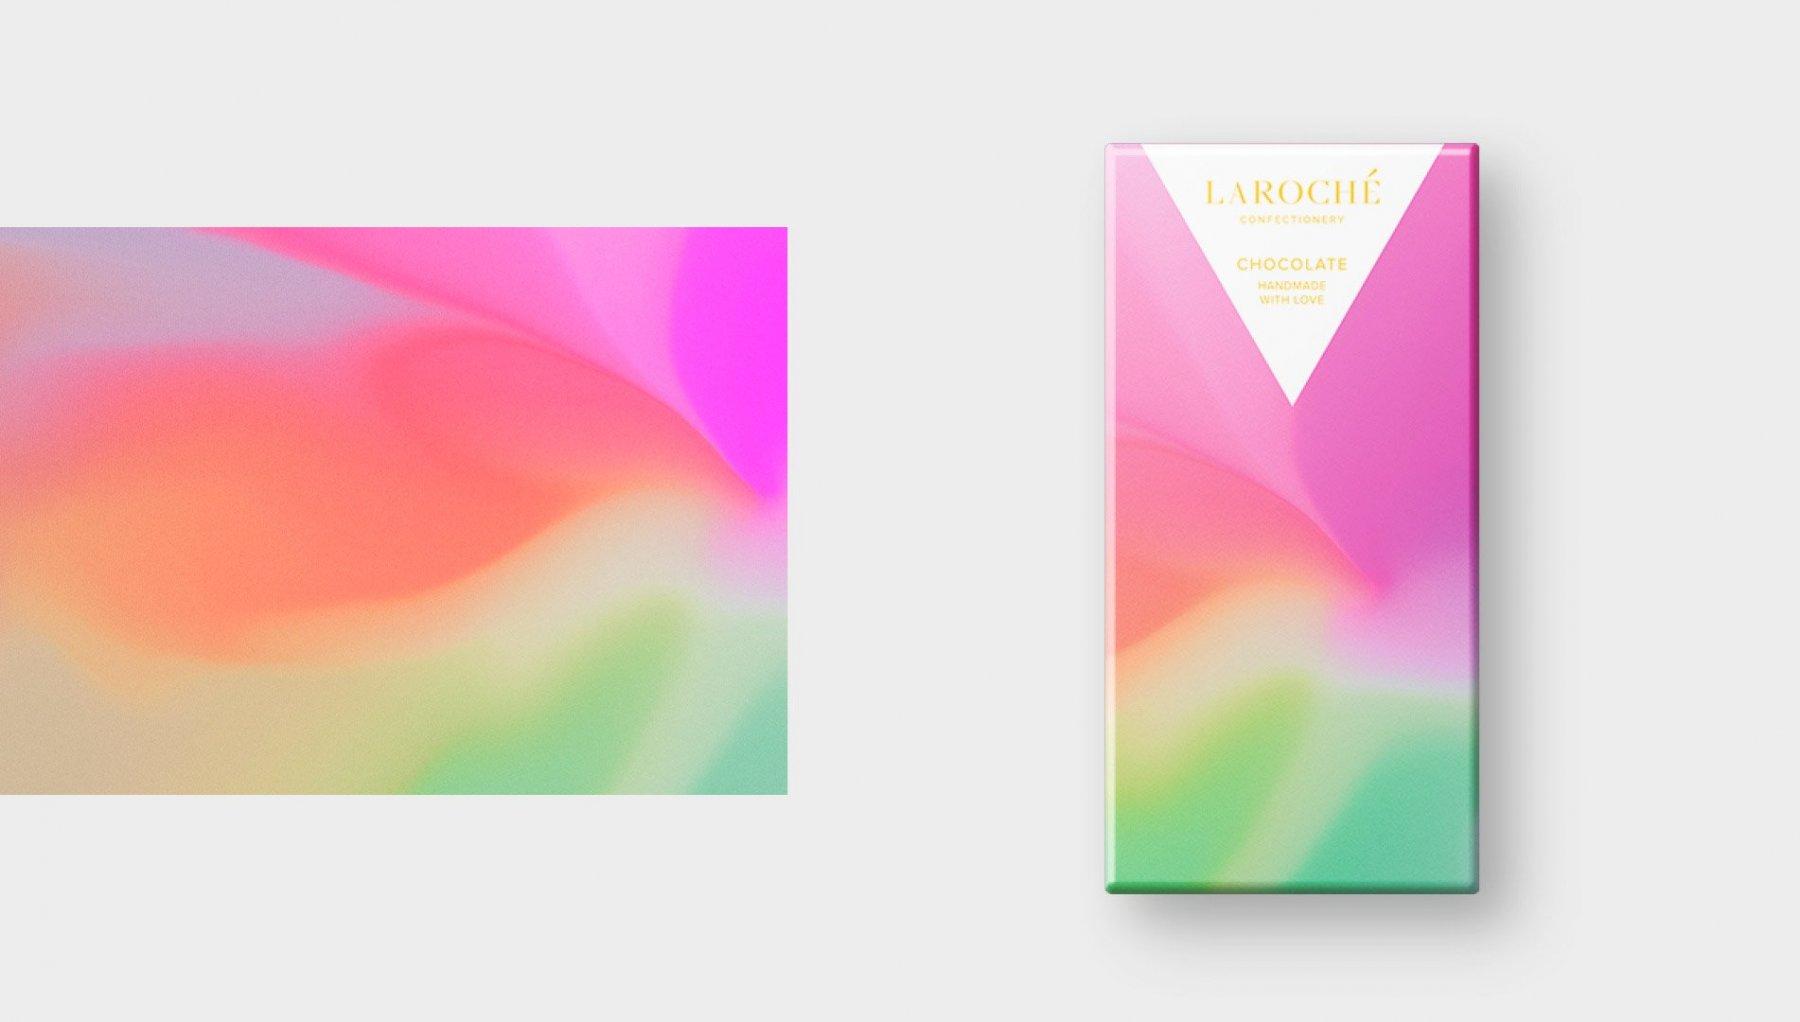 Laroche-Chocolate-Packaging-by-Martin-Naumann-02